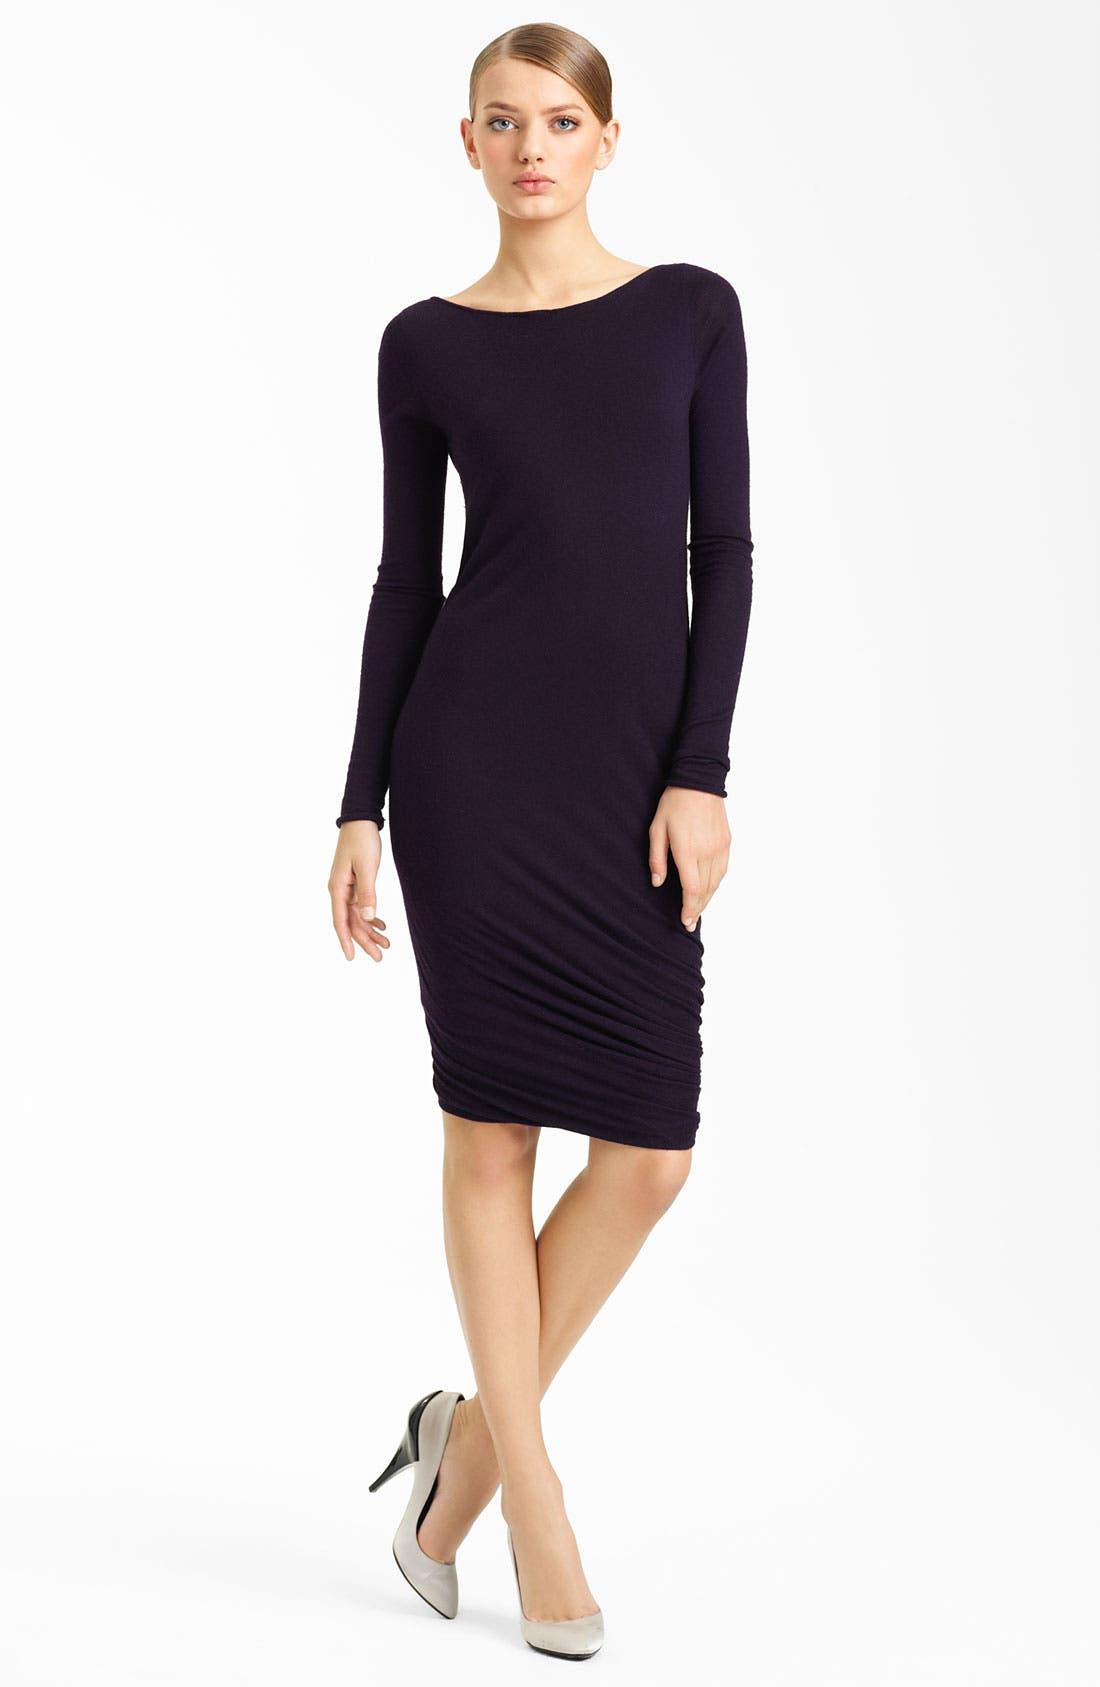 Alternate Image 1 Selected - Donna Karan Collection Twisted Hem Cashmere Dress